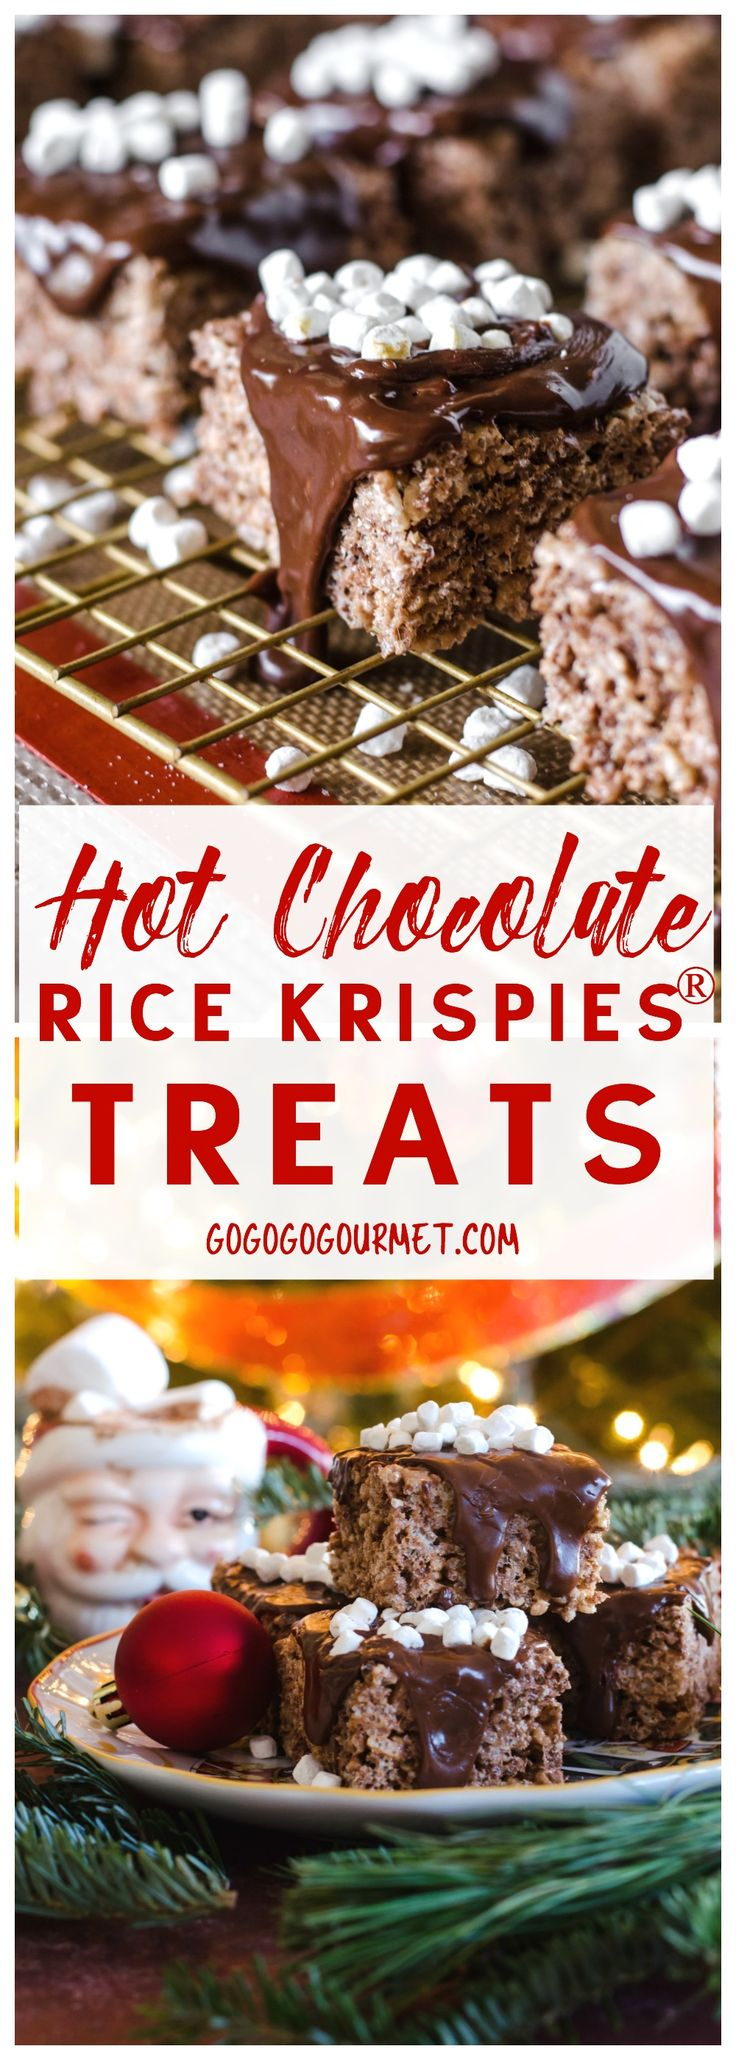 Hot Chocolate Rice Krispies® Treats are the perfect holiday treat! via @gogogogourmet #ad #HolidayTreatMaking